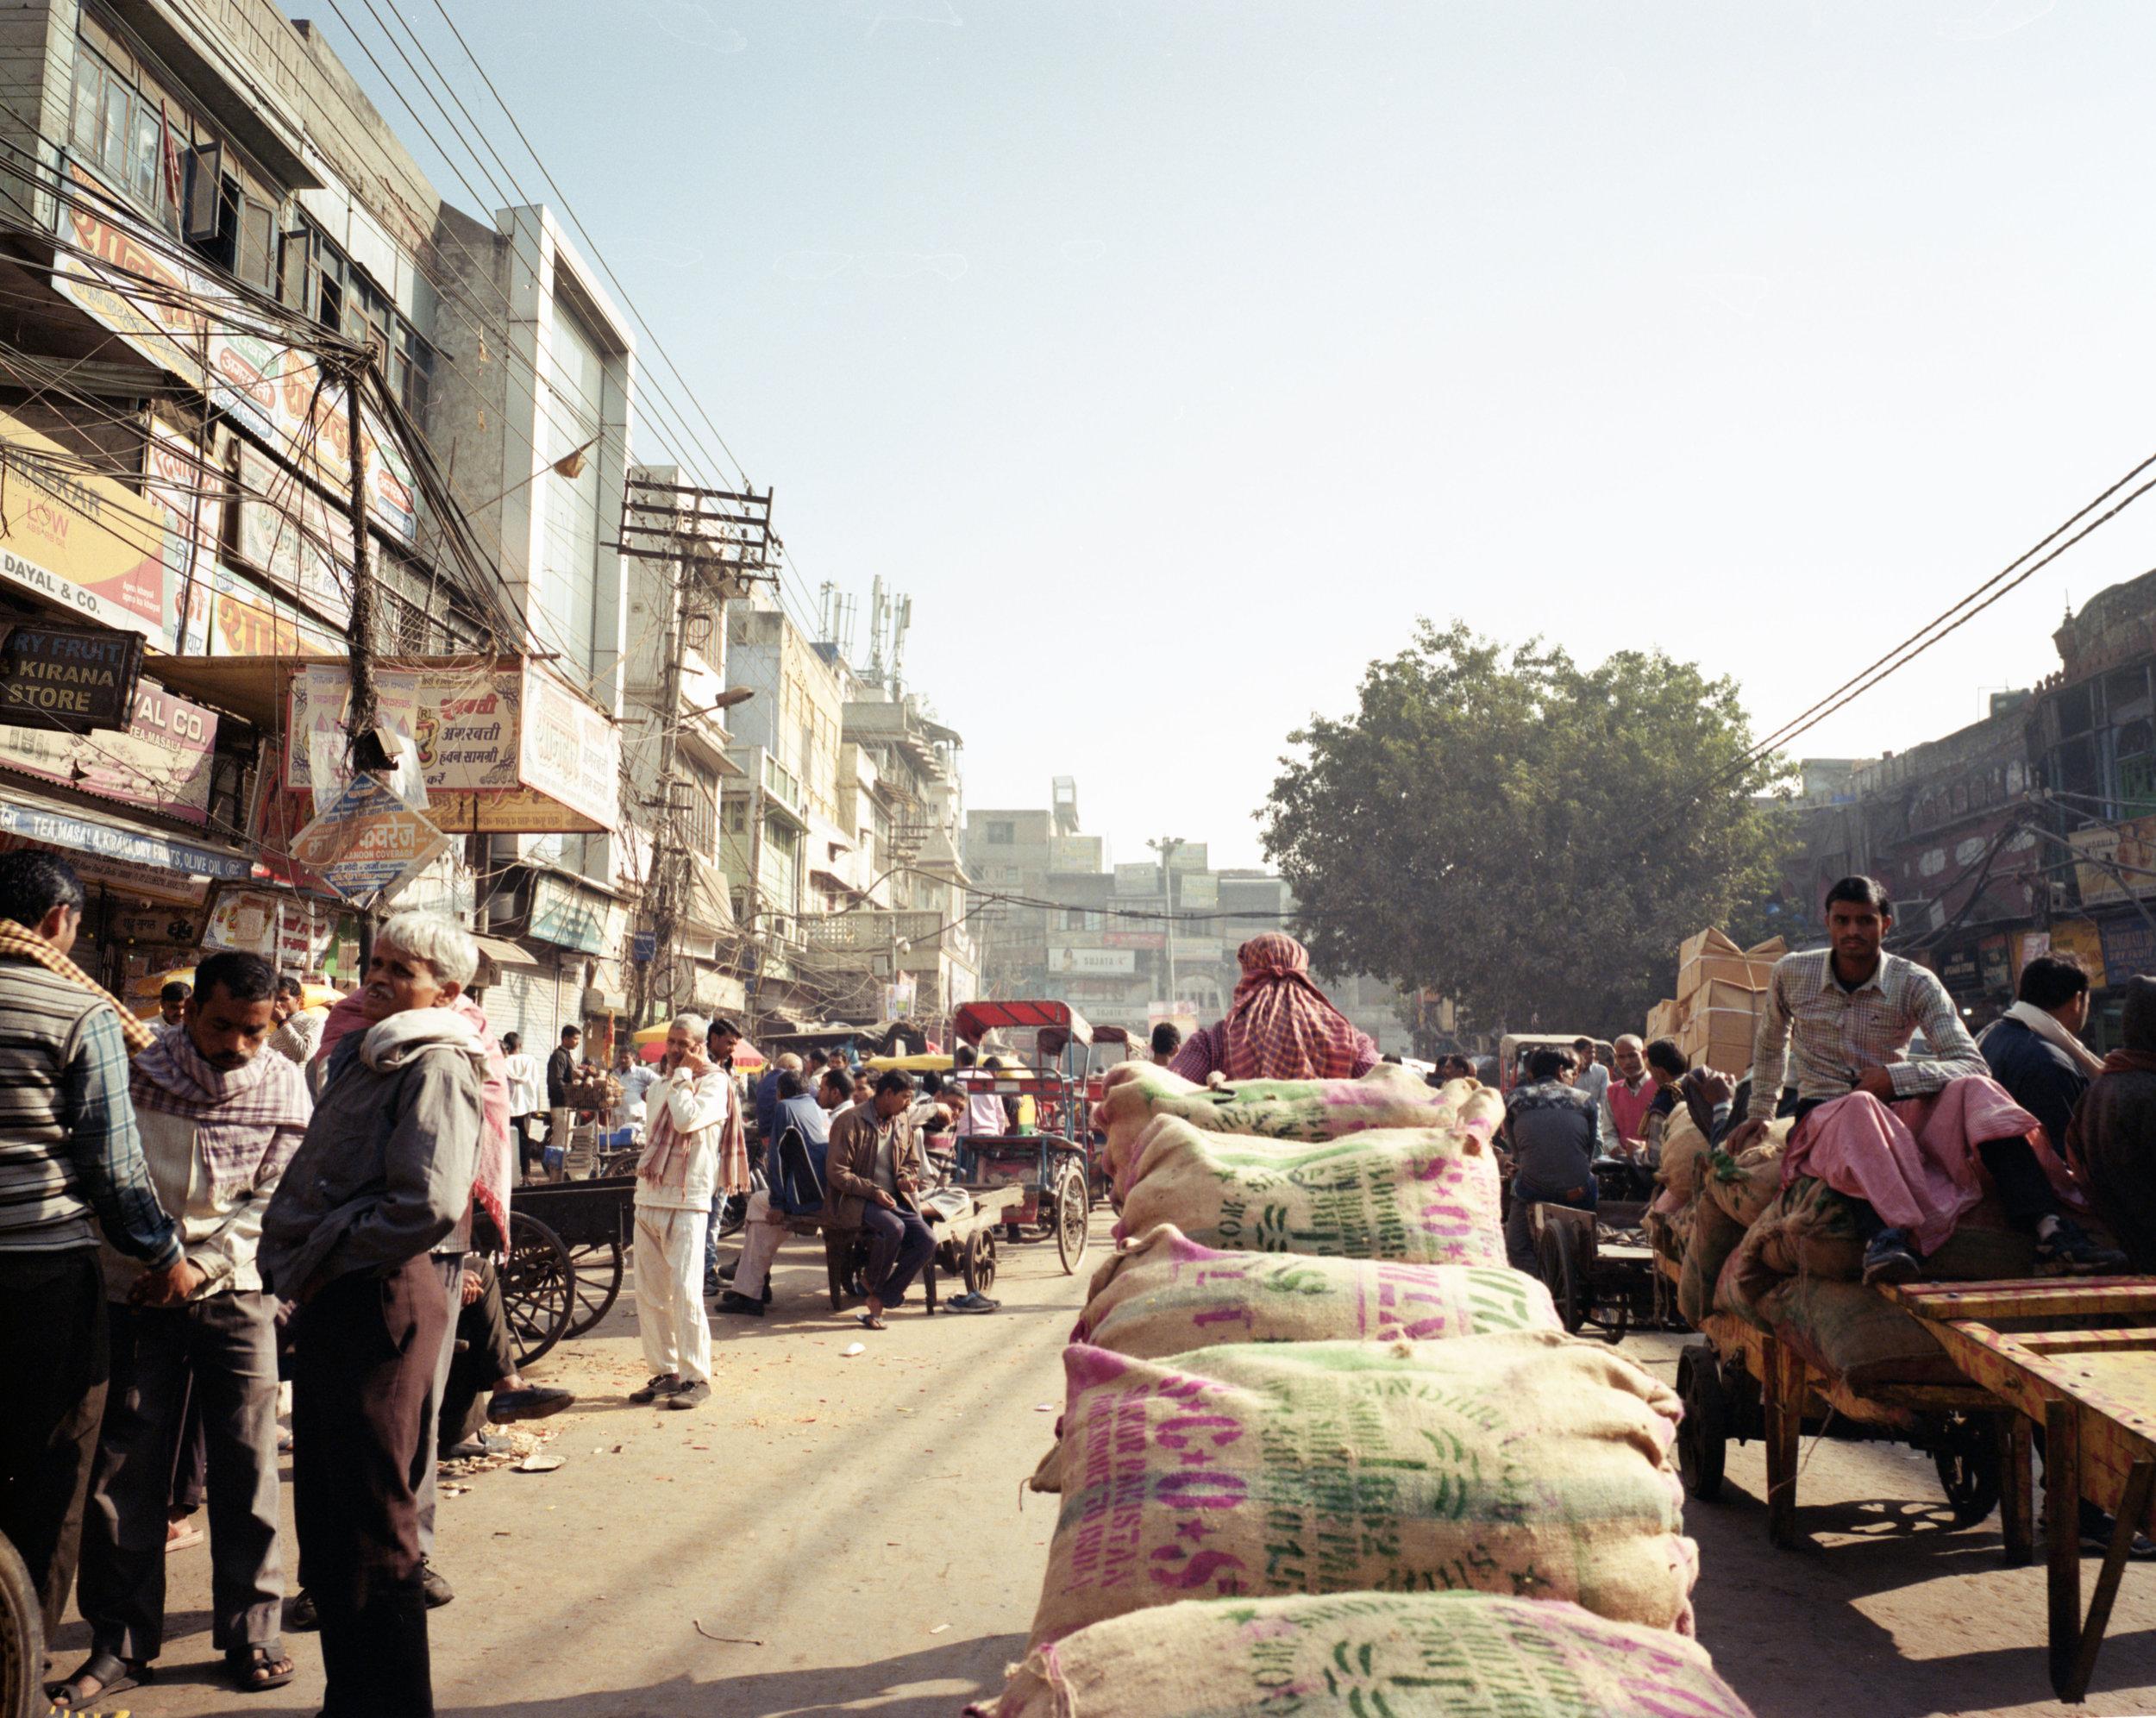 The Streets of Delhi Fuji GF670w | Lomography 100